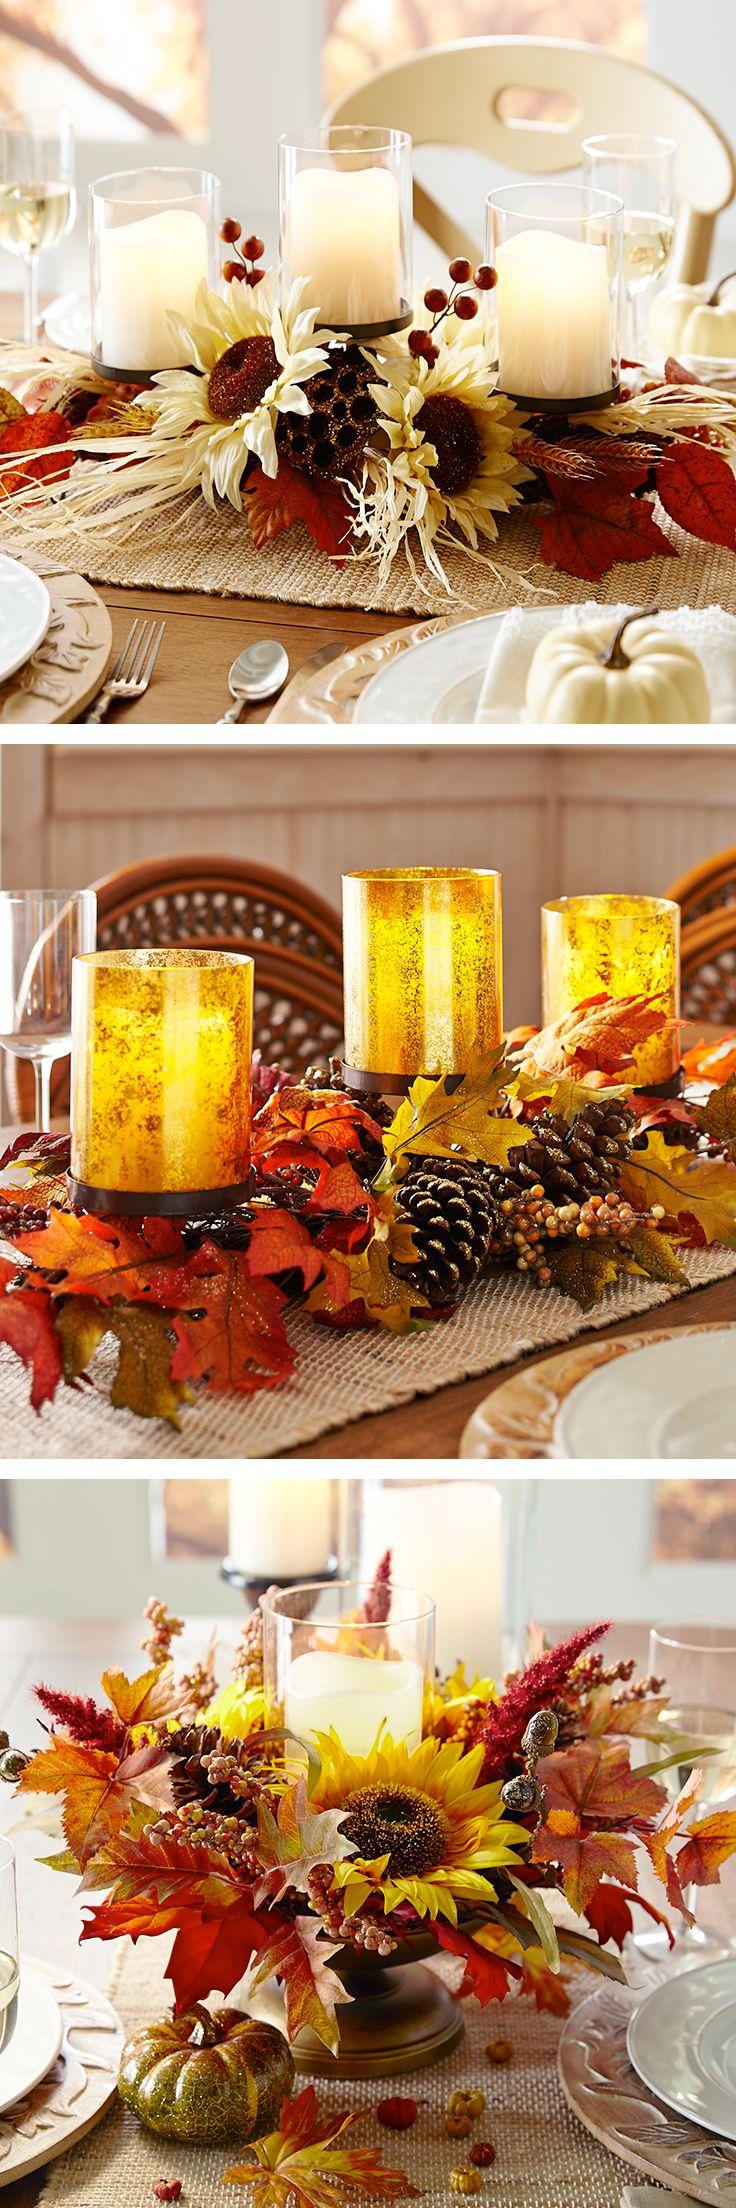 532 Best Images About Party Centerpieces Tablescapes